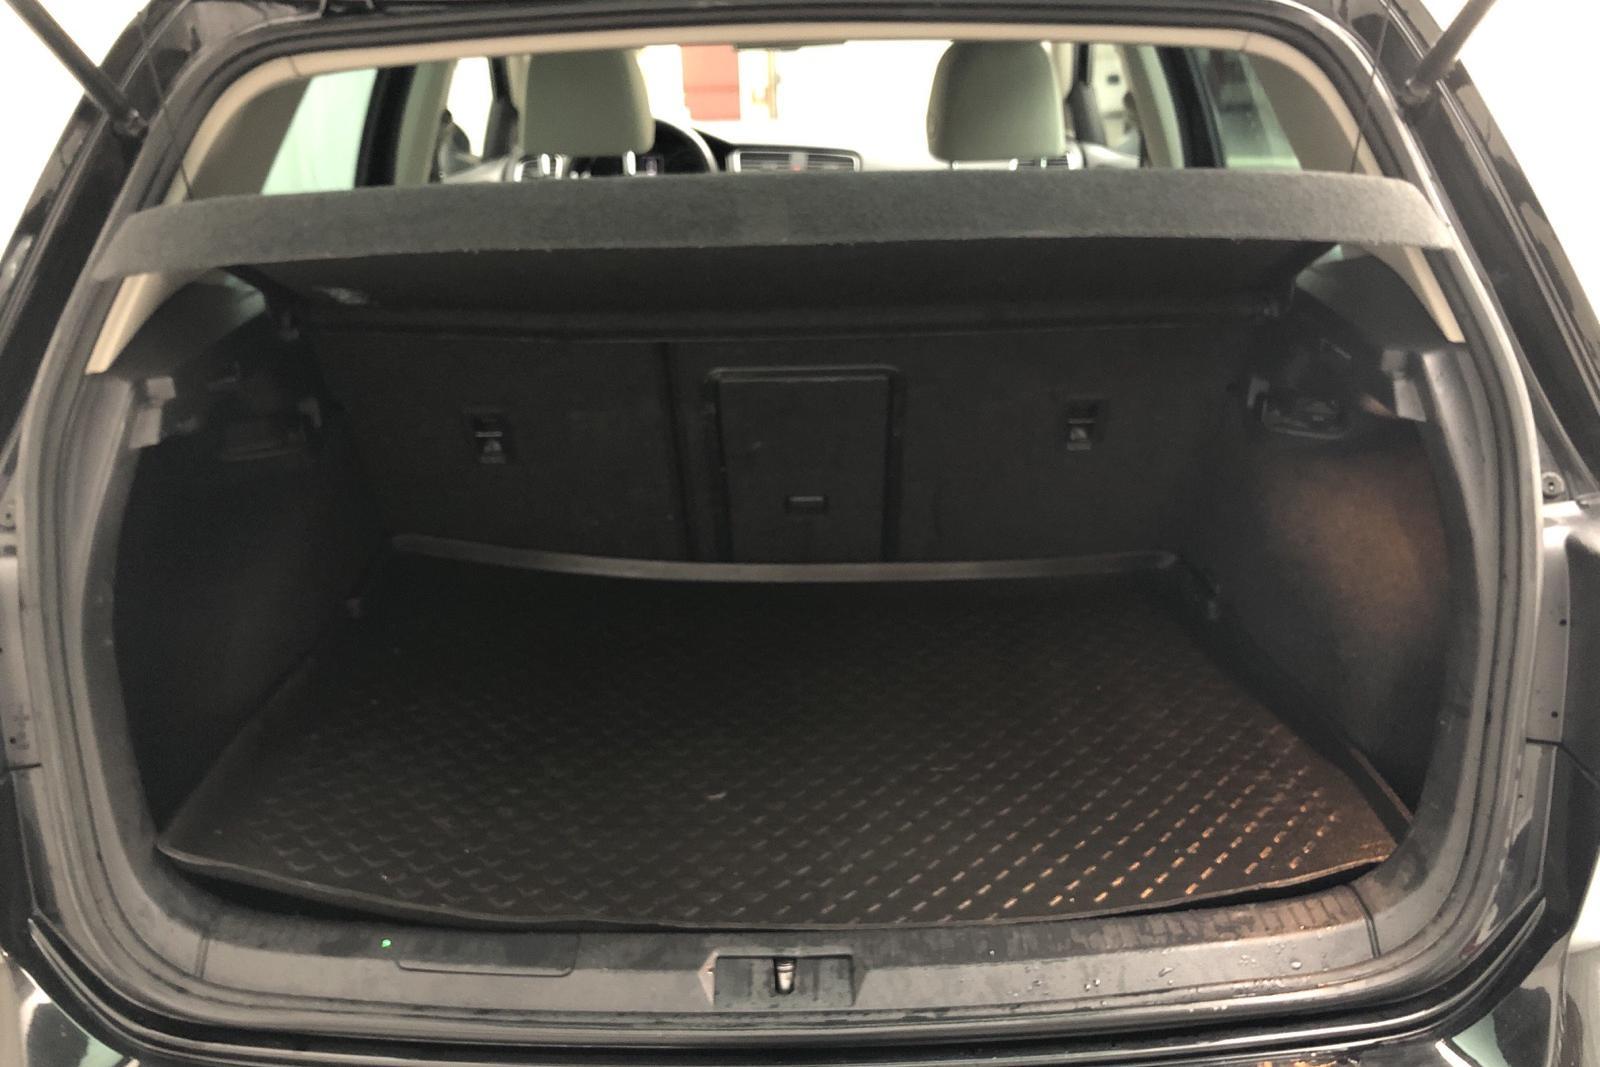 VW Golf VII 2.0 TDI BlueMotion Technology 5dr 4Motion (150hk) - 29 800 mil - Manuell - svart - 2014